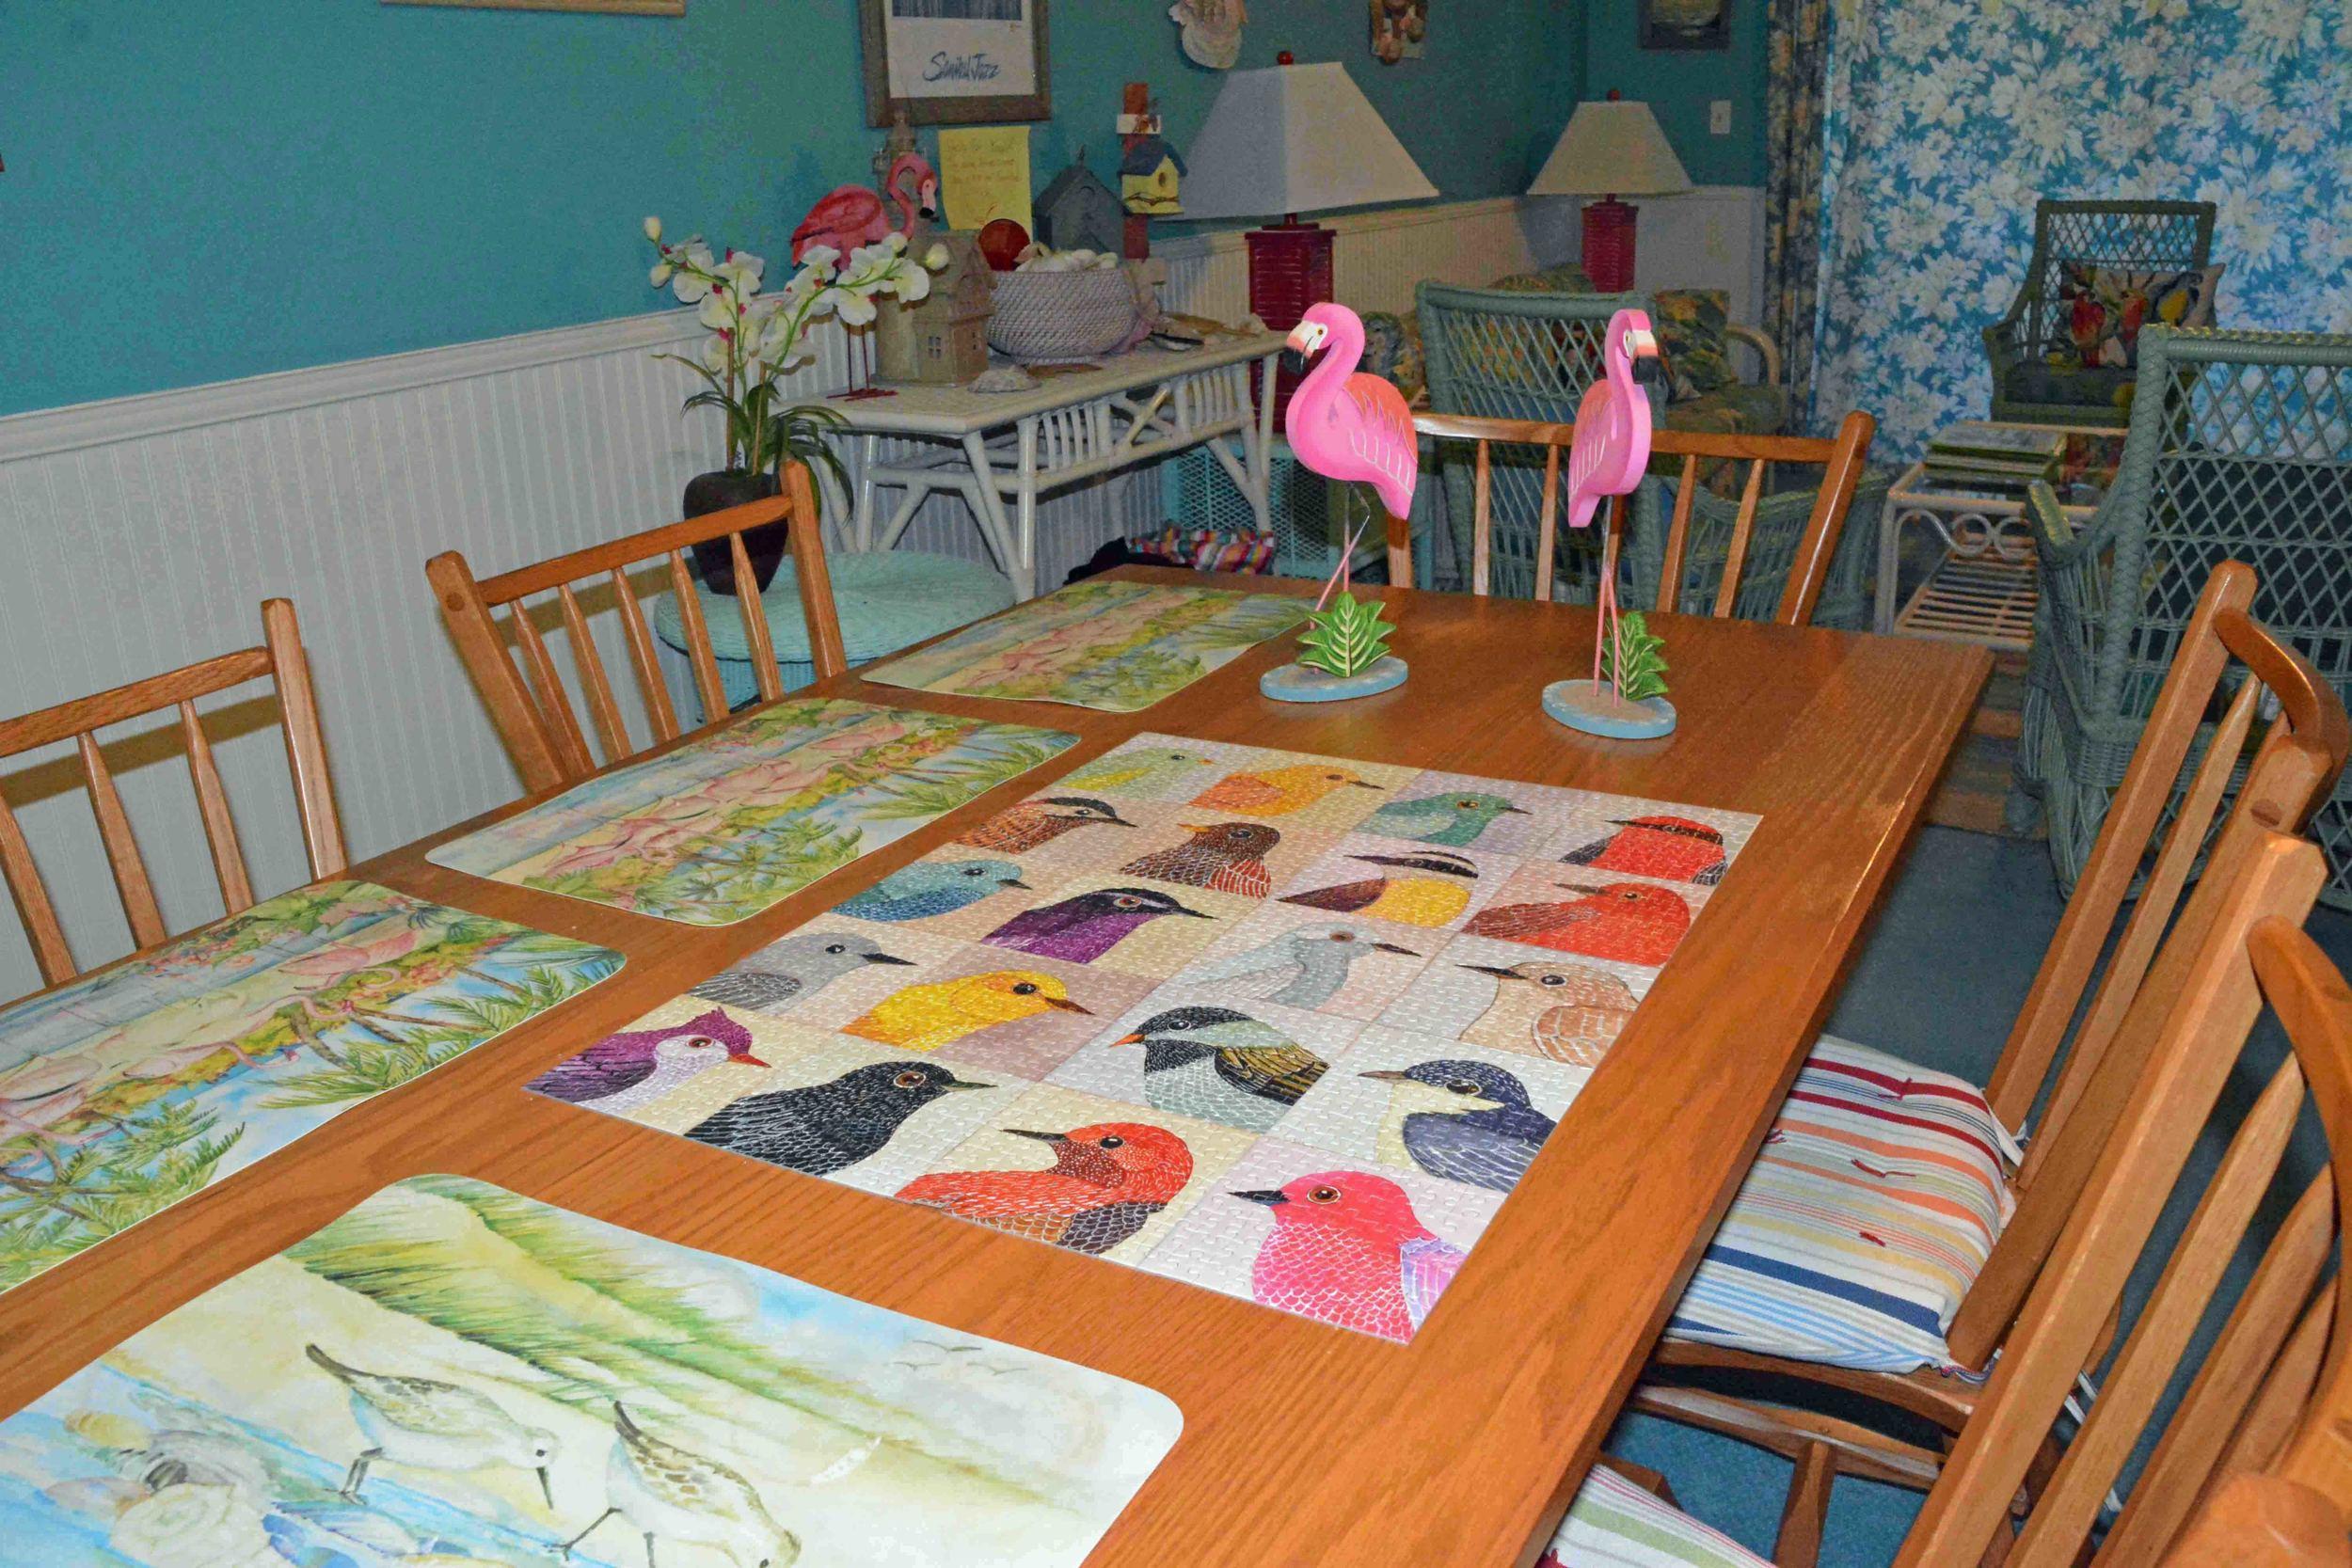 Bird-Puzzle-Flamingoes_12-17-2014_fx_web_SM1_0085.jpg